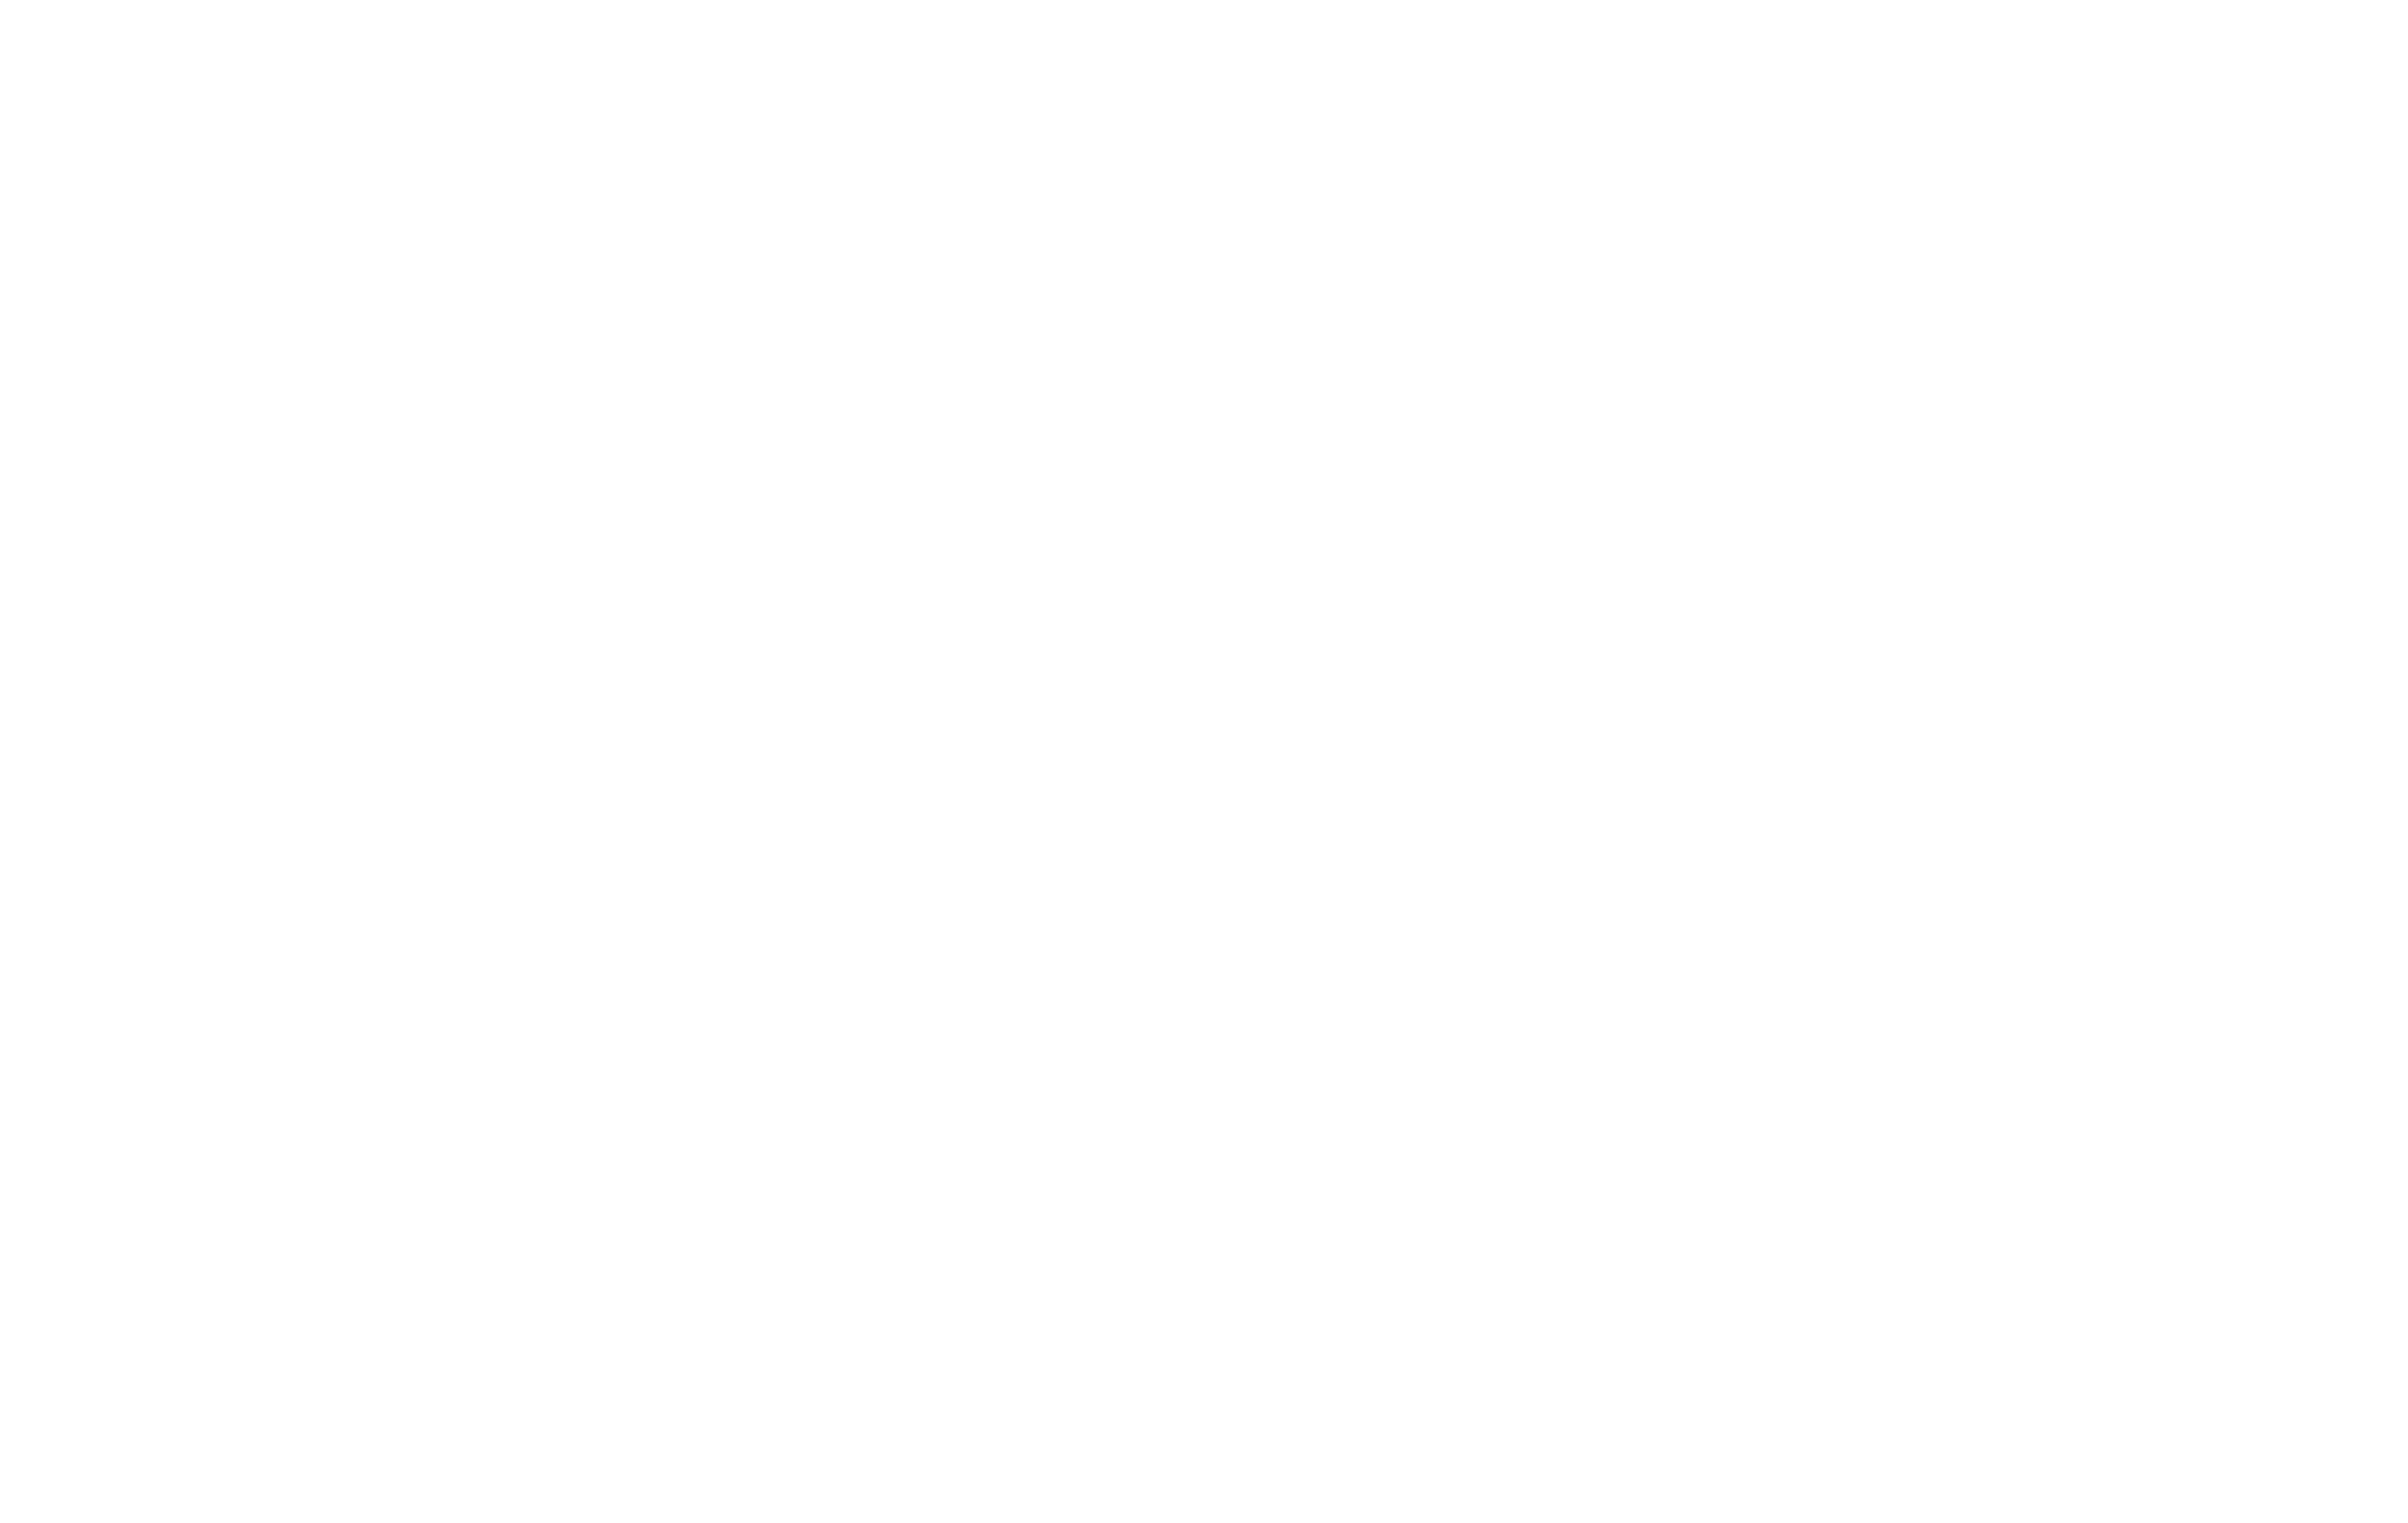 Verdensmål i Værdikæden_Logo